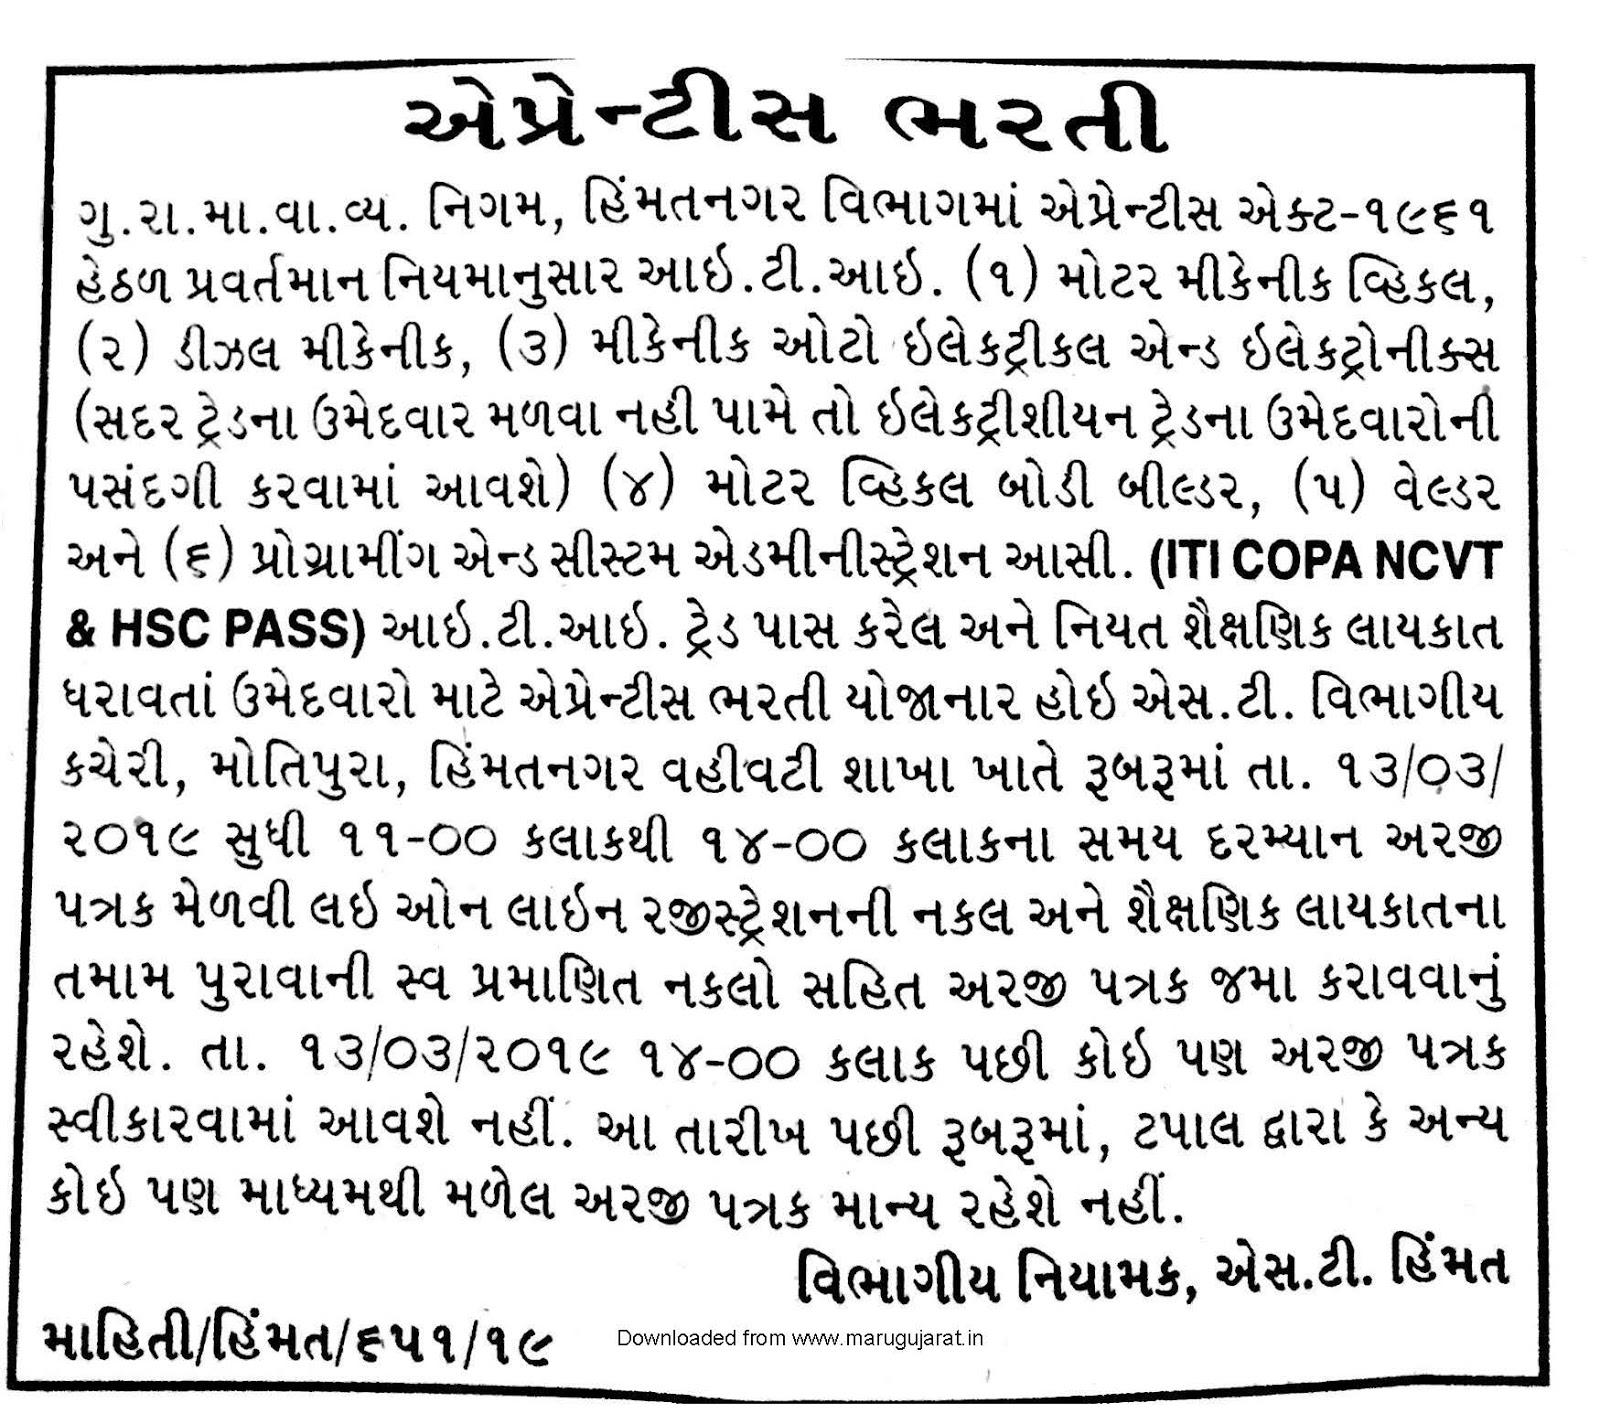 Gsrtc Himmatnagar Recruitment For Apprentice Trainee